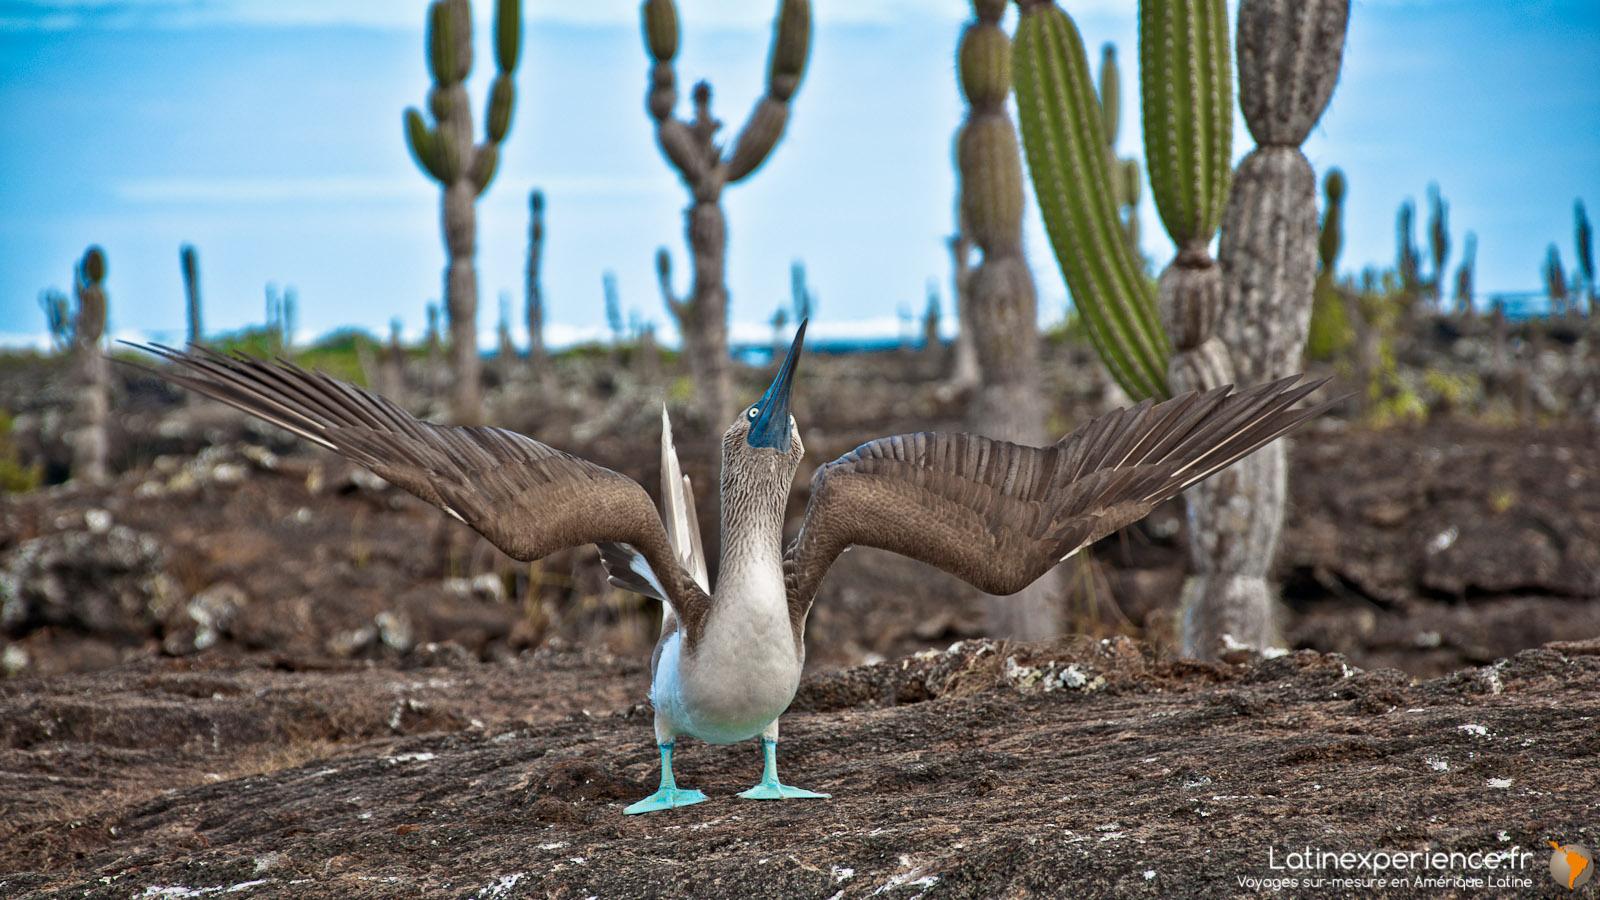 Galapagos - Fou à pattes bleus - Latinexperience voyages